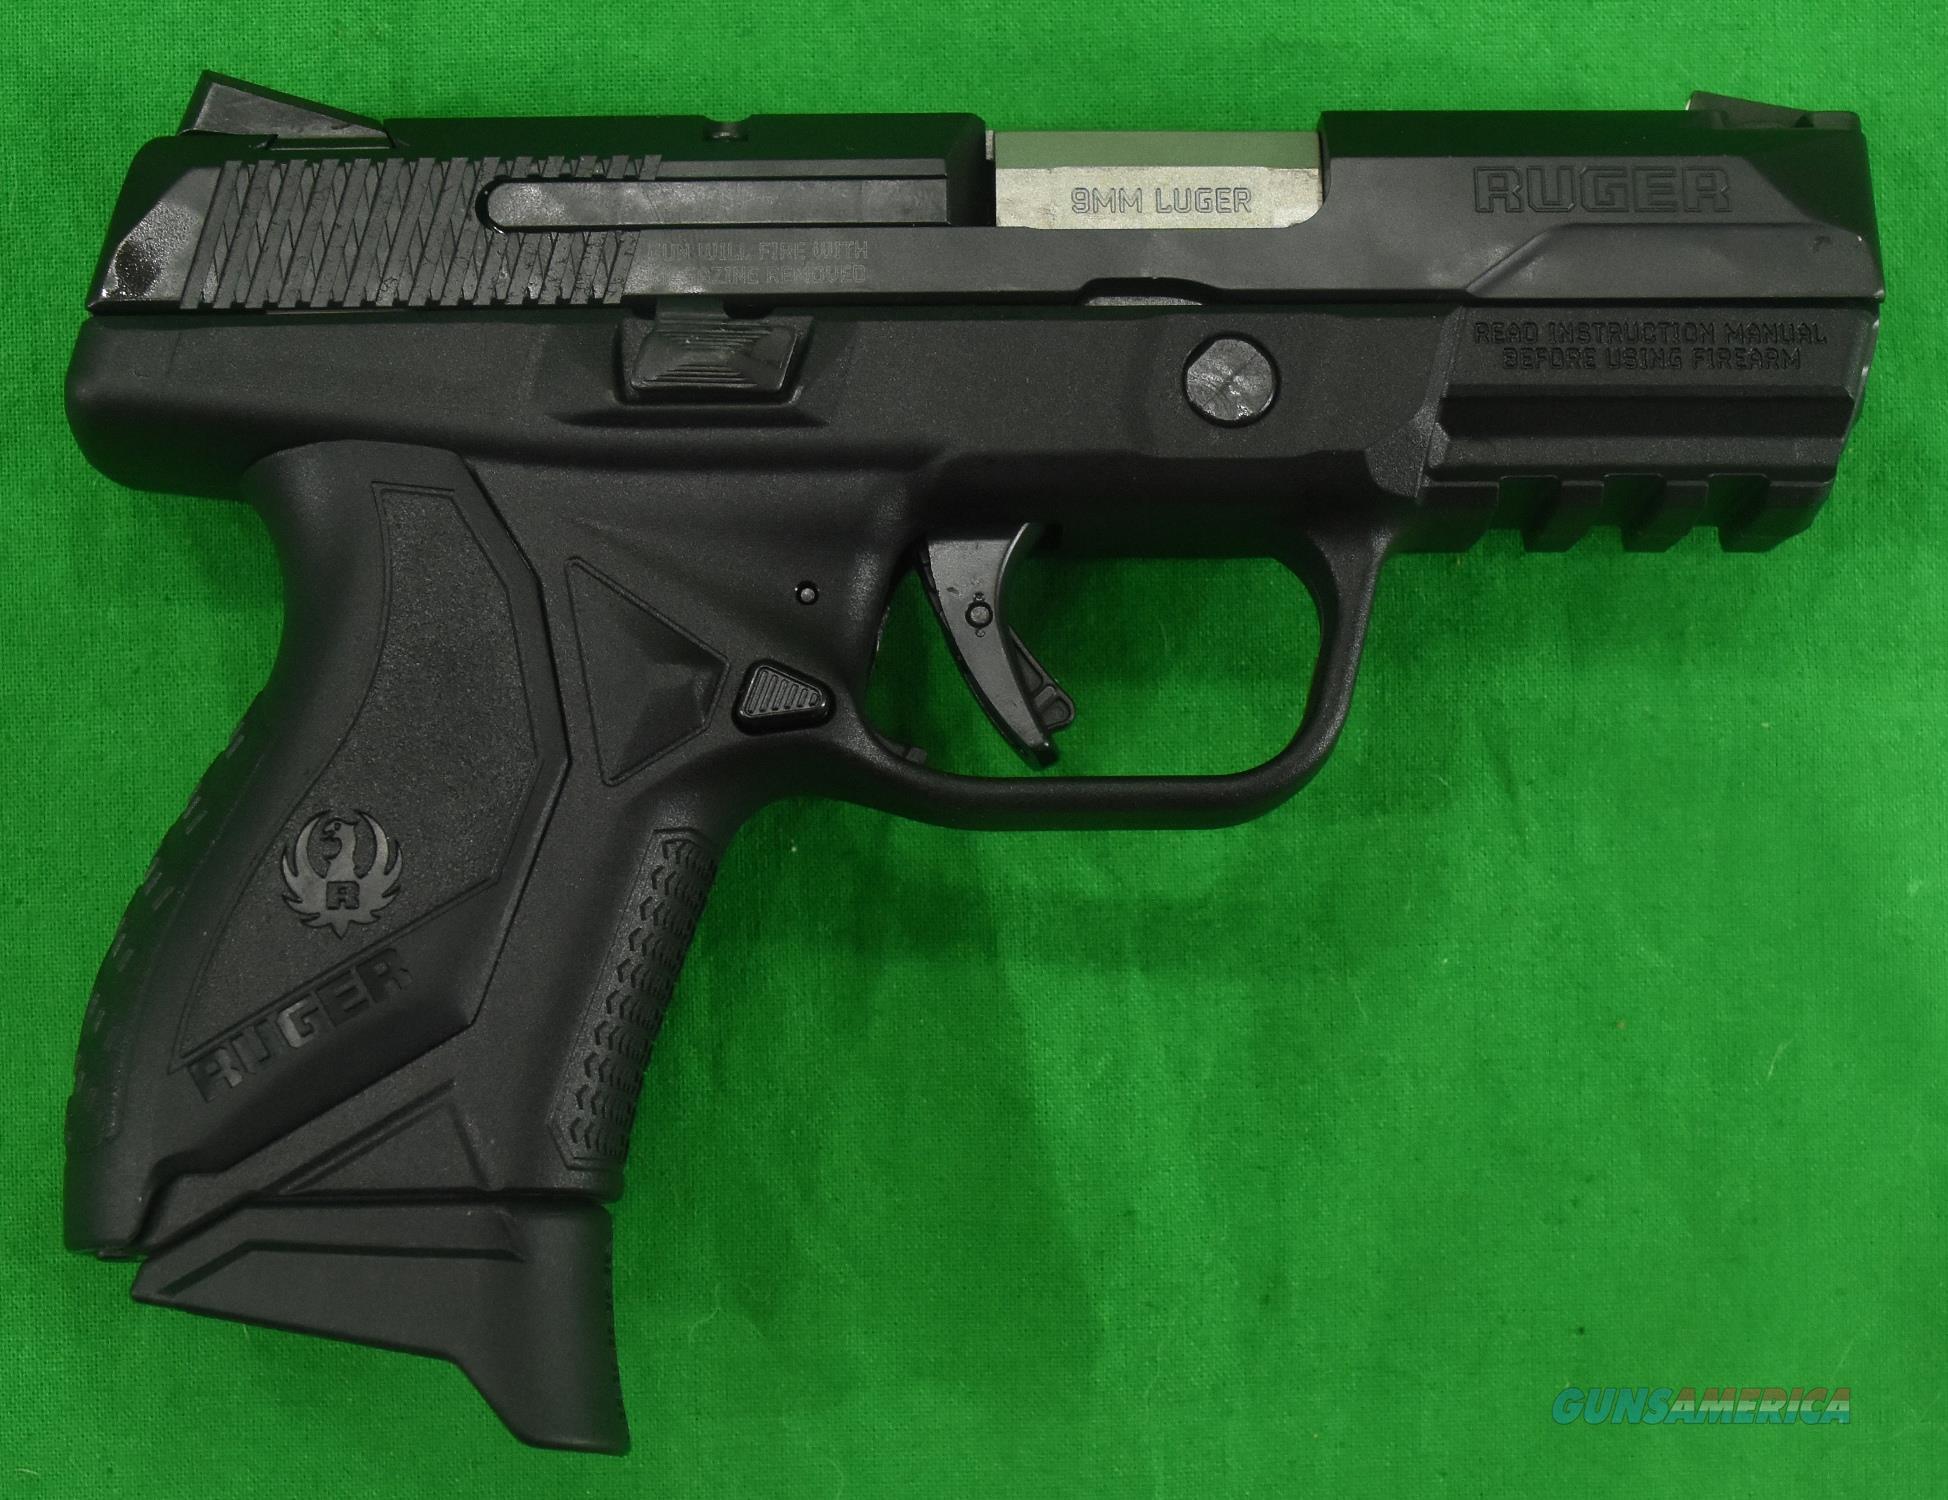 American Compact 9mm 3.55In  8637  Guns > Pistols > S Misc Pistols